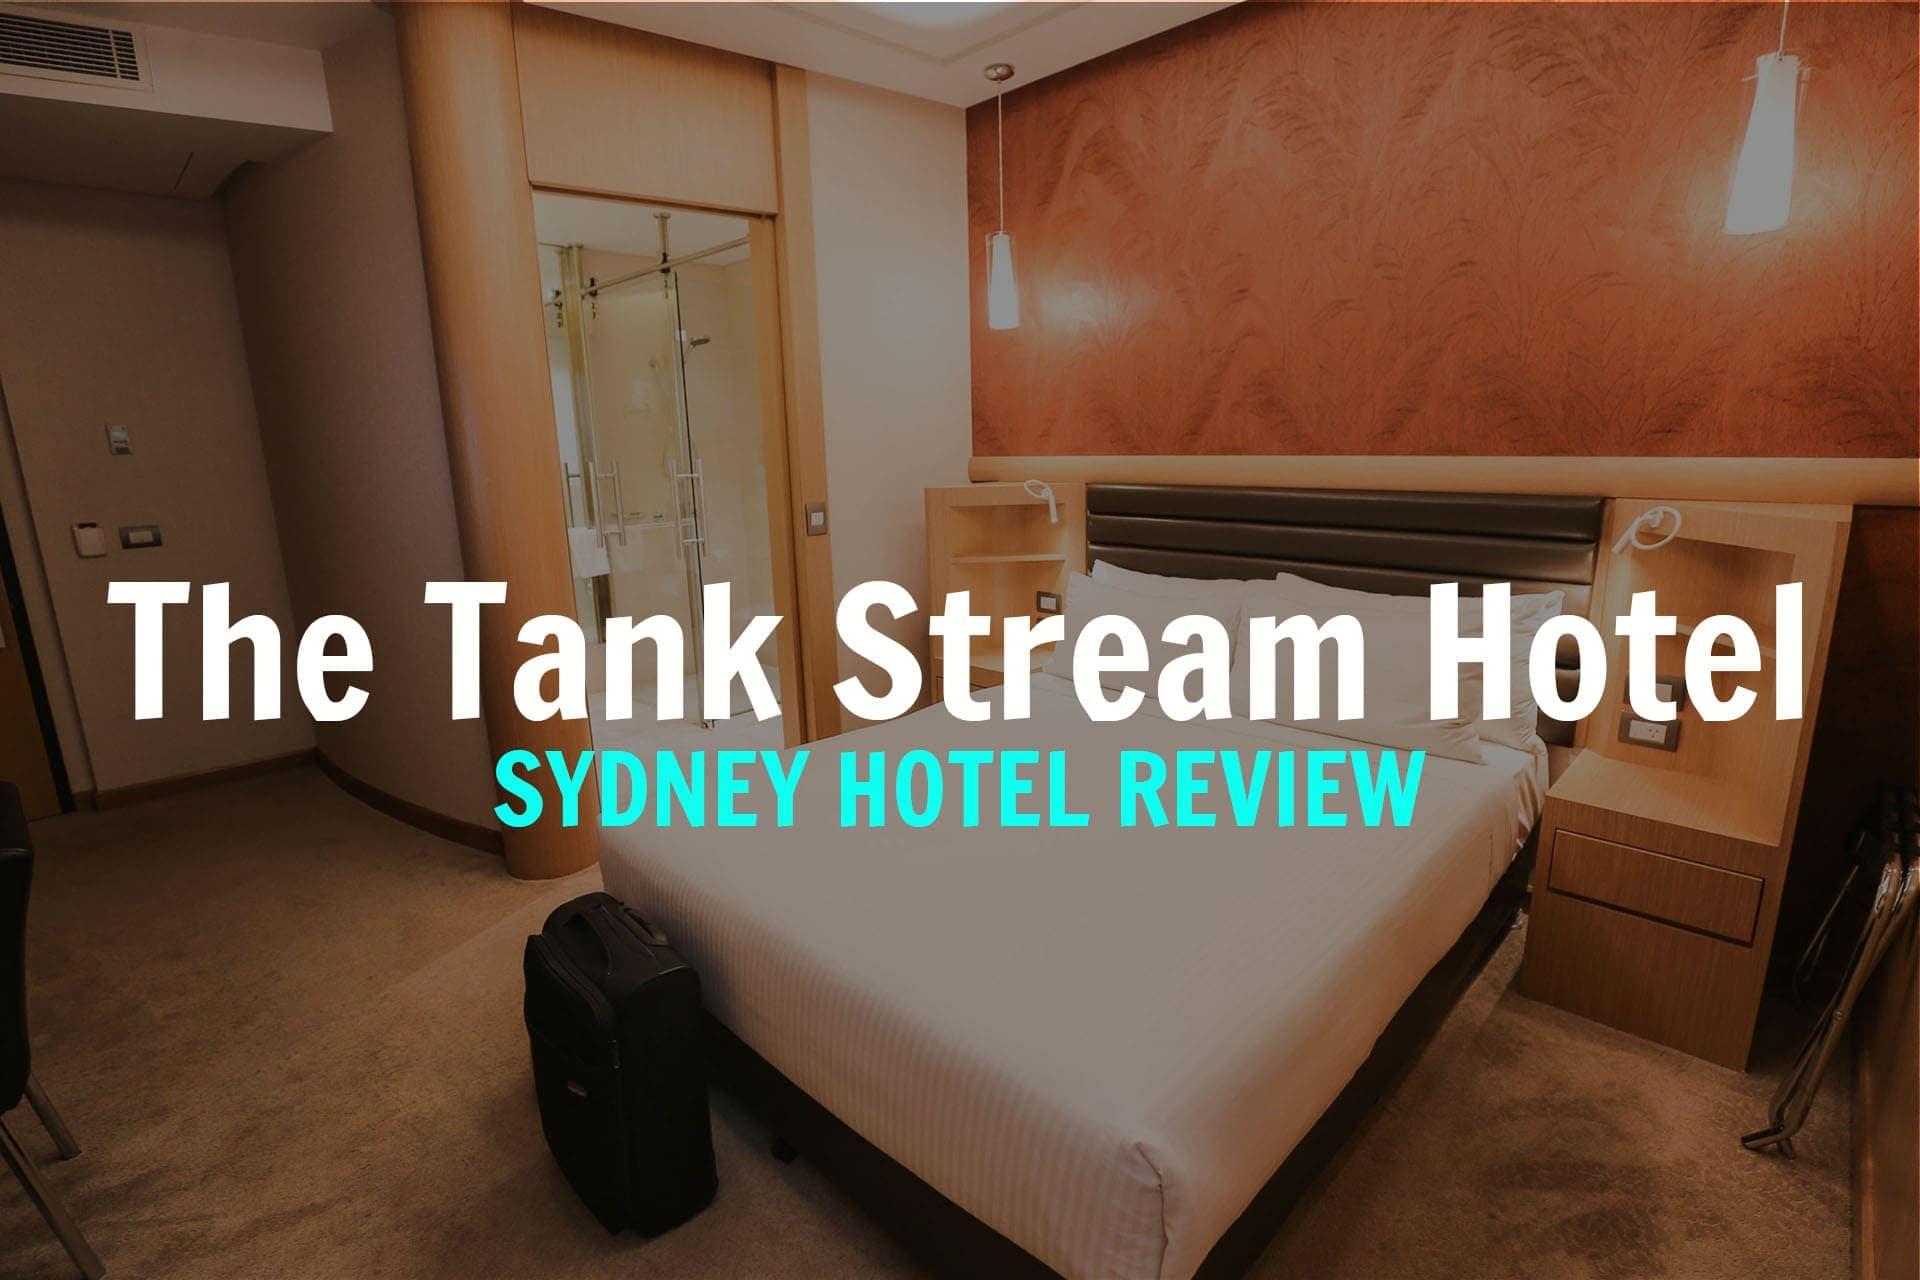 THE-TANK-STREAM-HOTEL